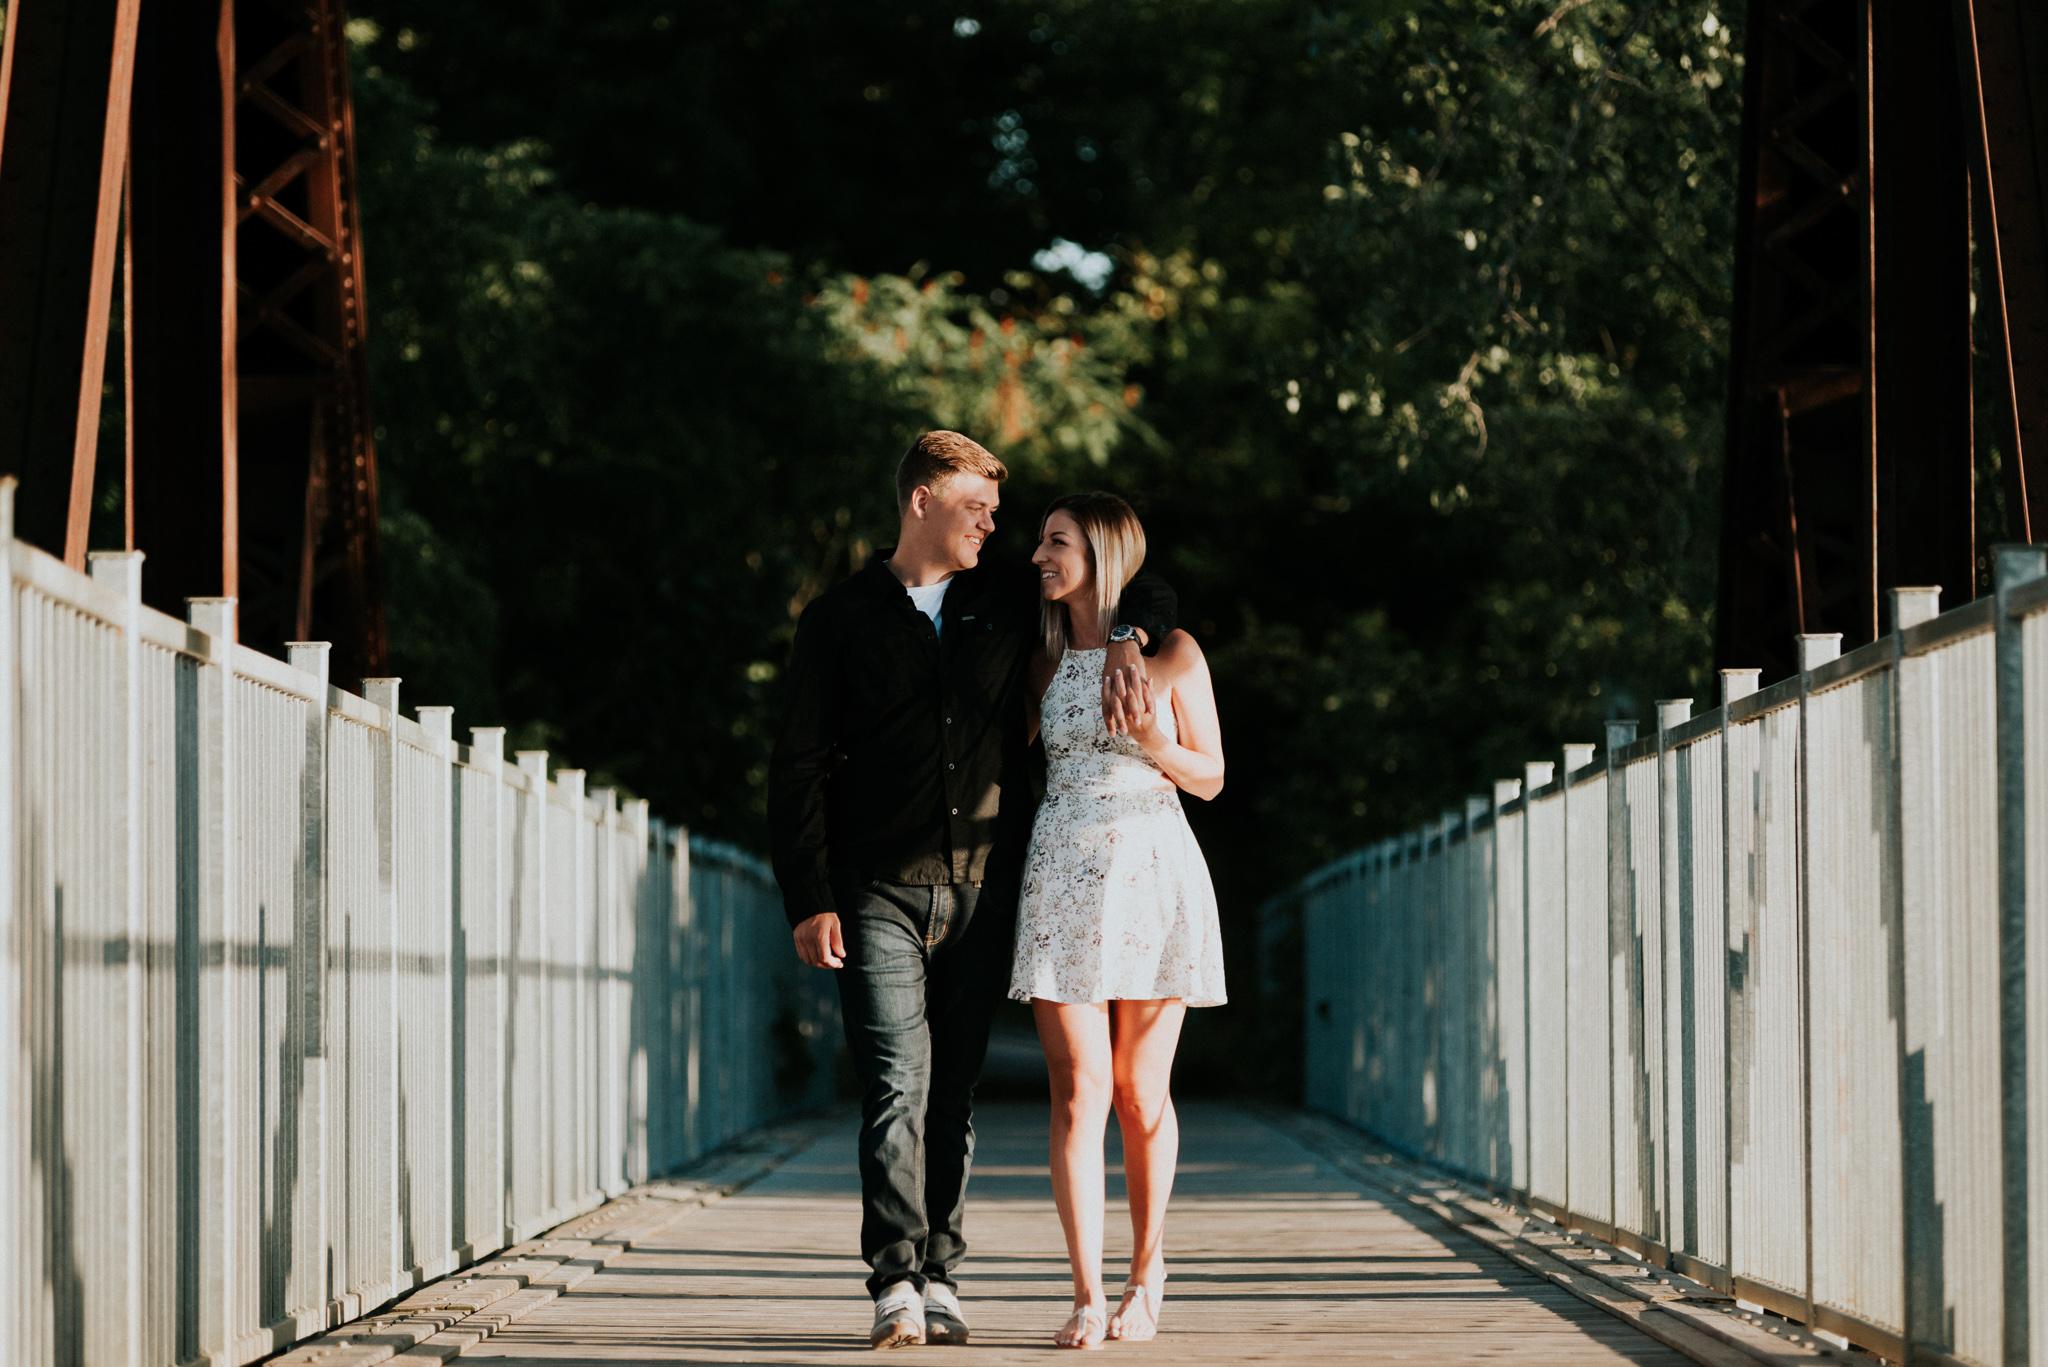 Klairissa & Doug